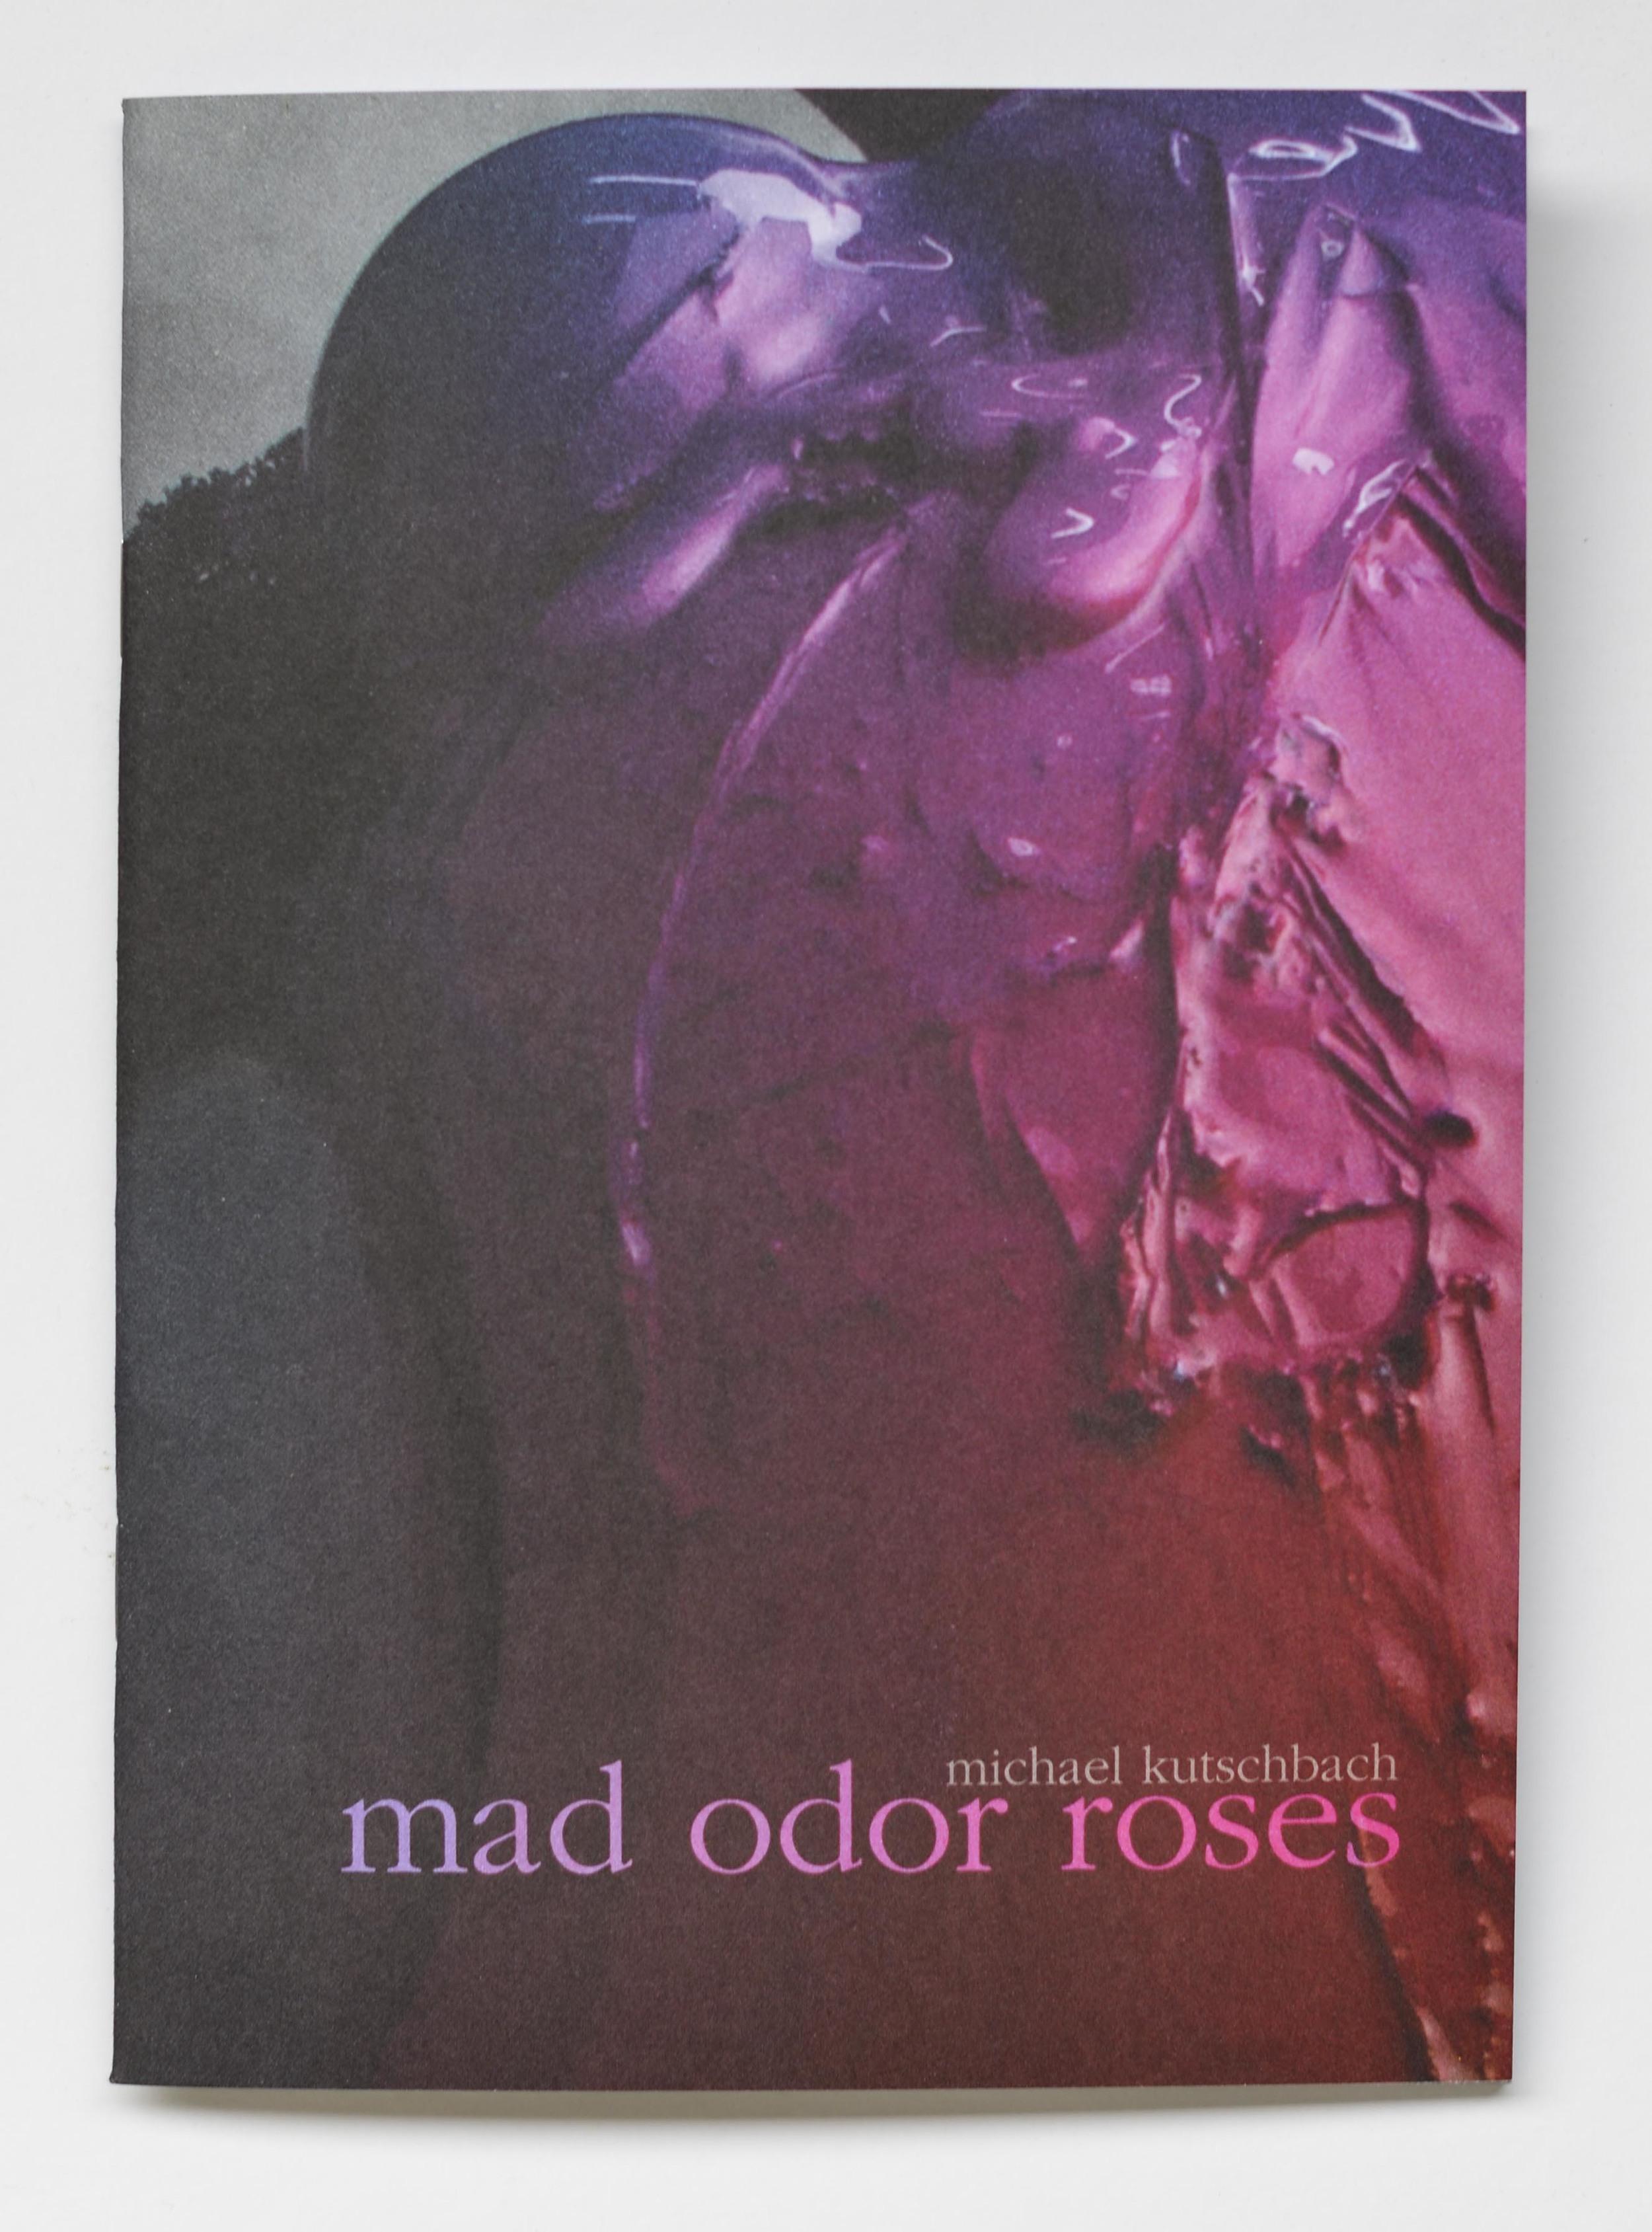 1 michael kutschbach mad odor roses catalogue.jpg